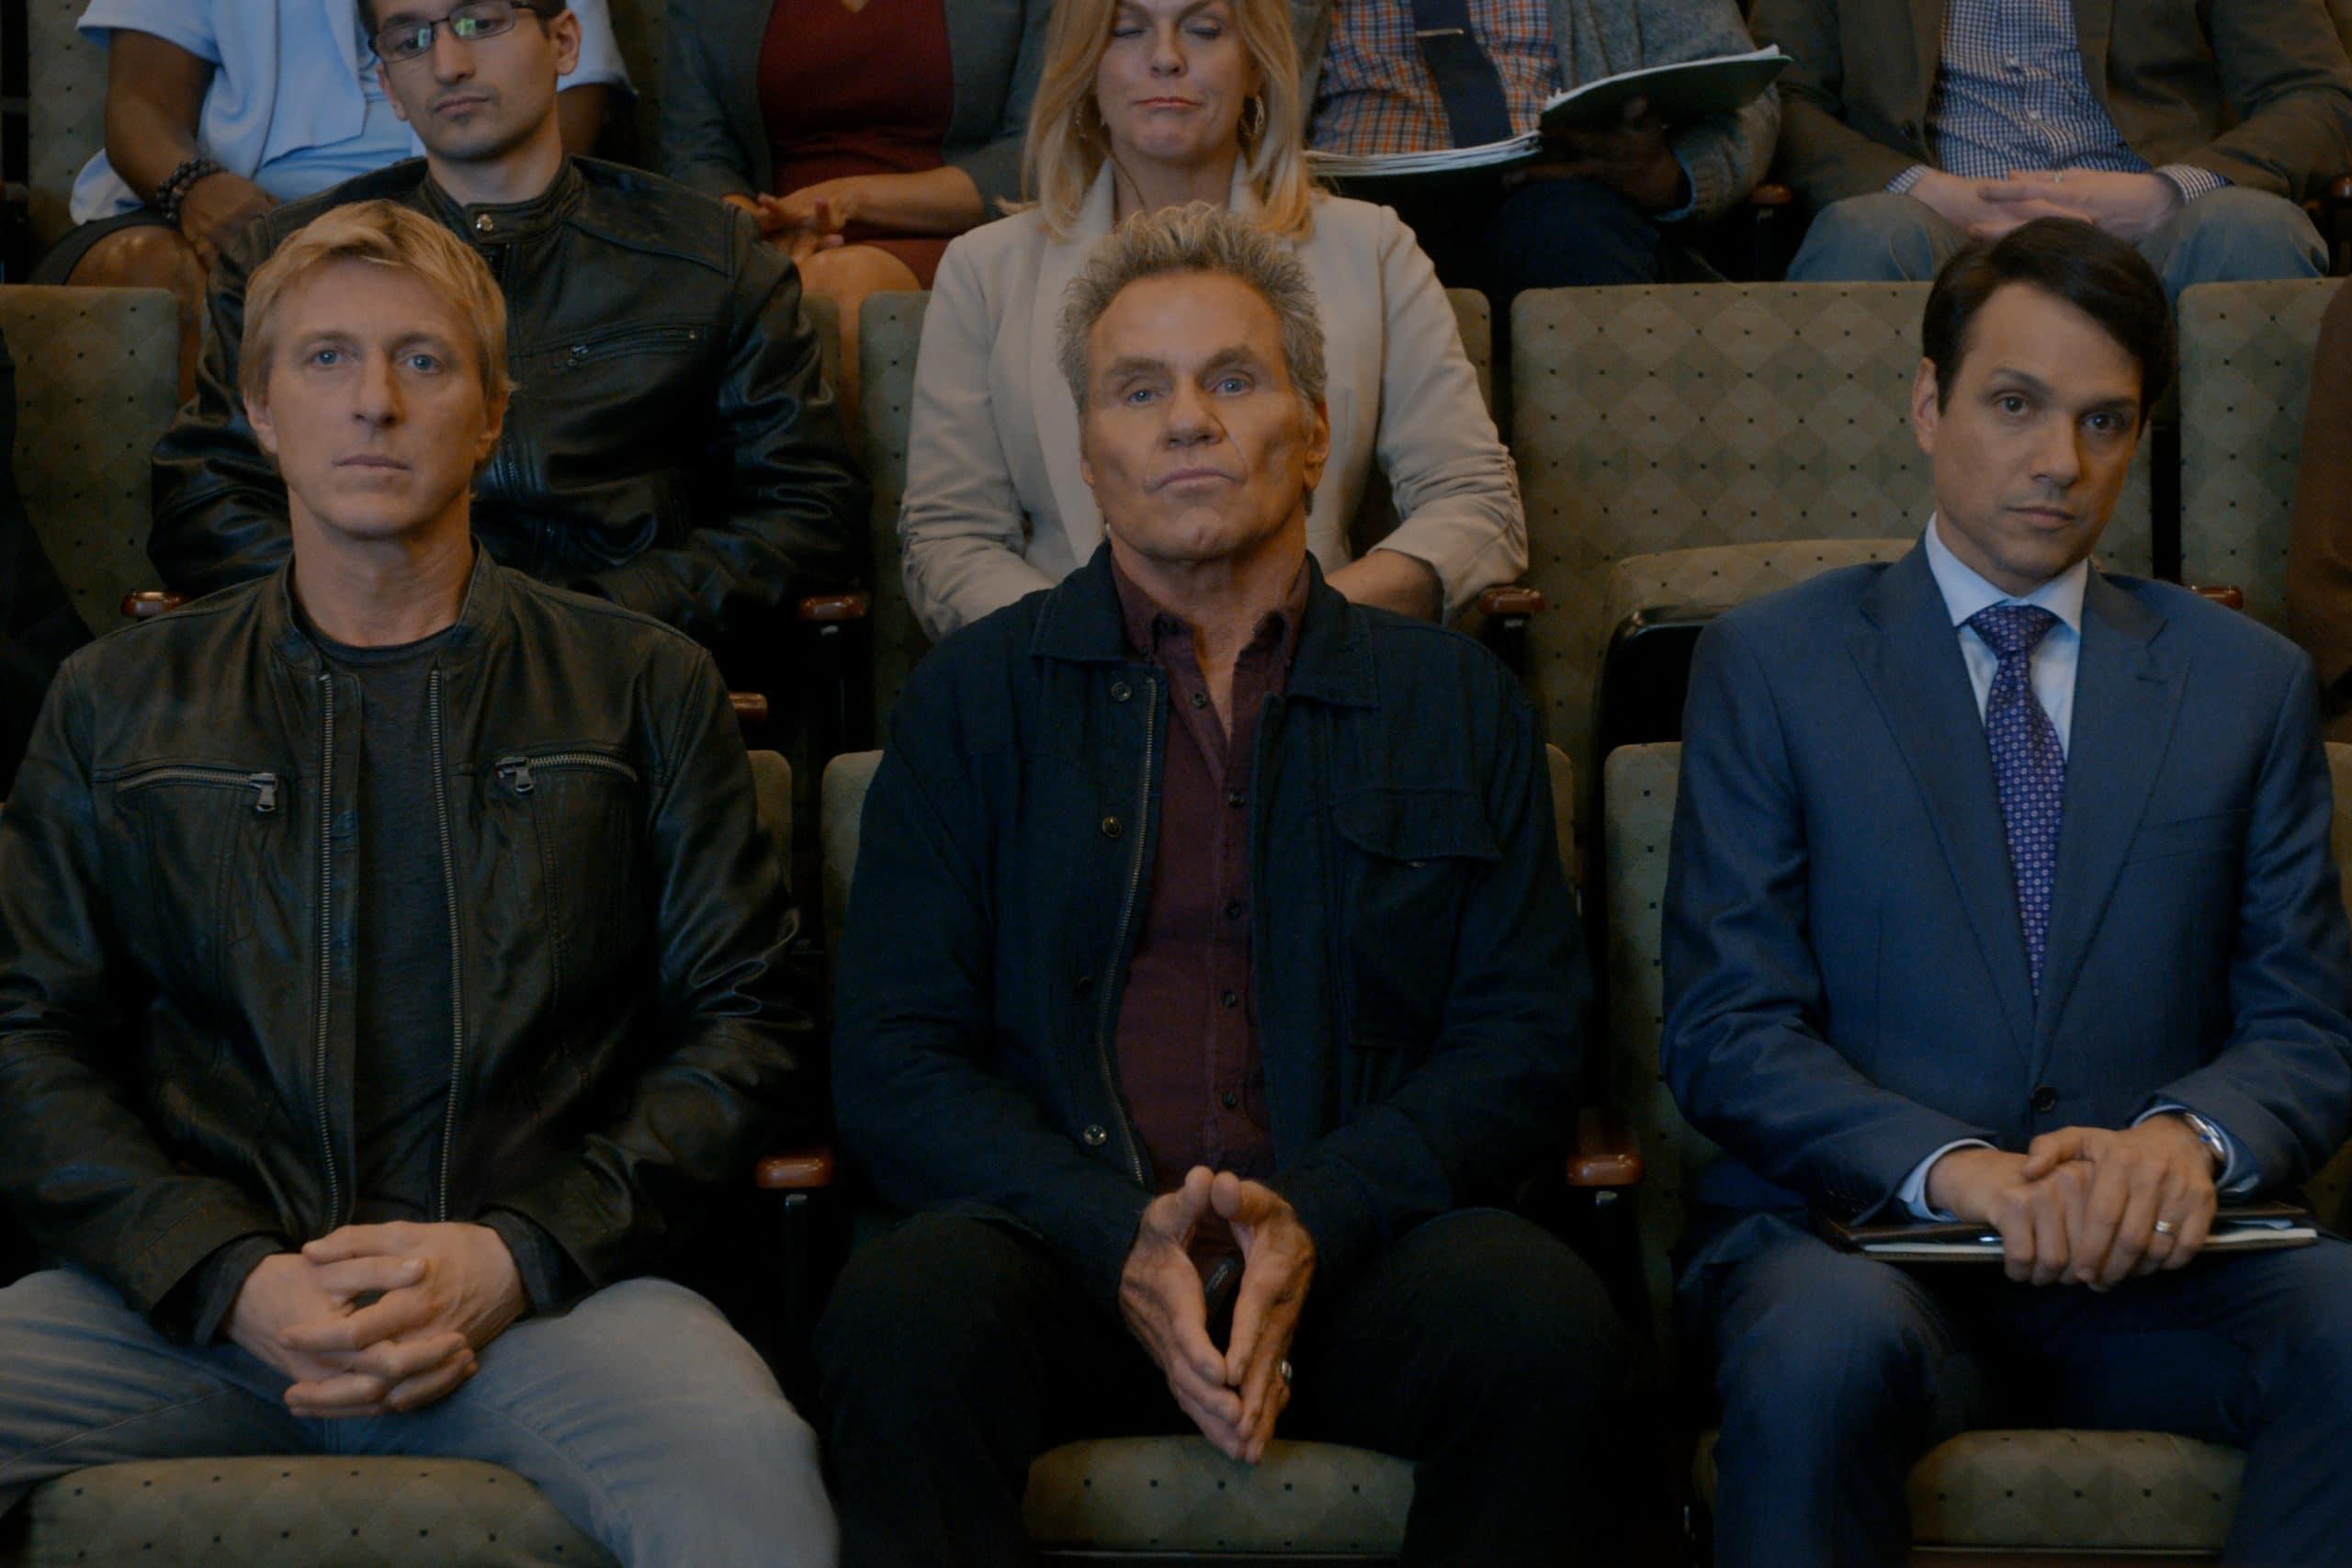 William Zabka as Johnny Lawrence, Martin Kove as John Kreese, and Ralph Macchio as Daniel LaRusso in Cobra Kai season 3